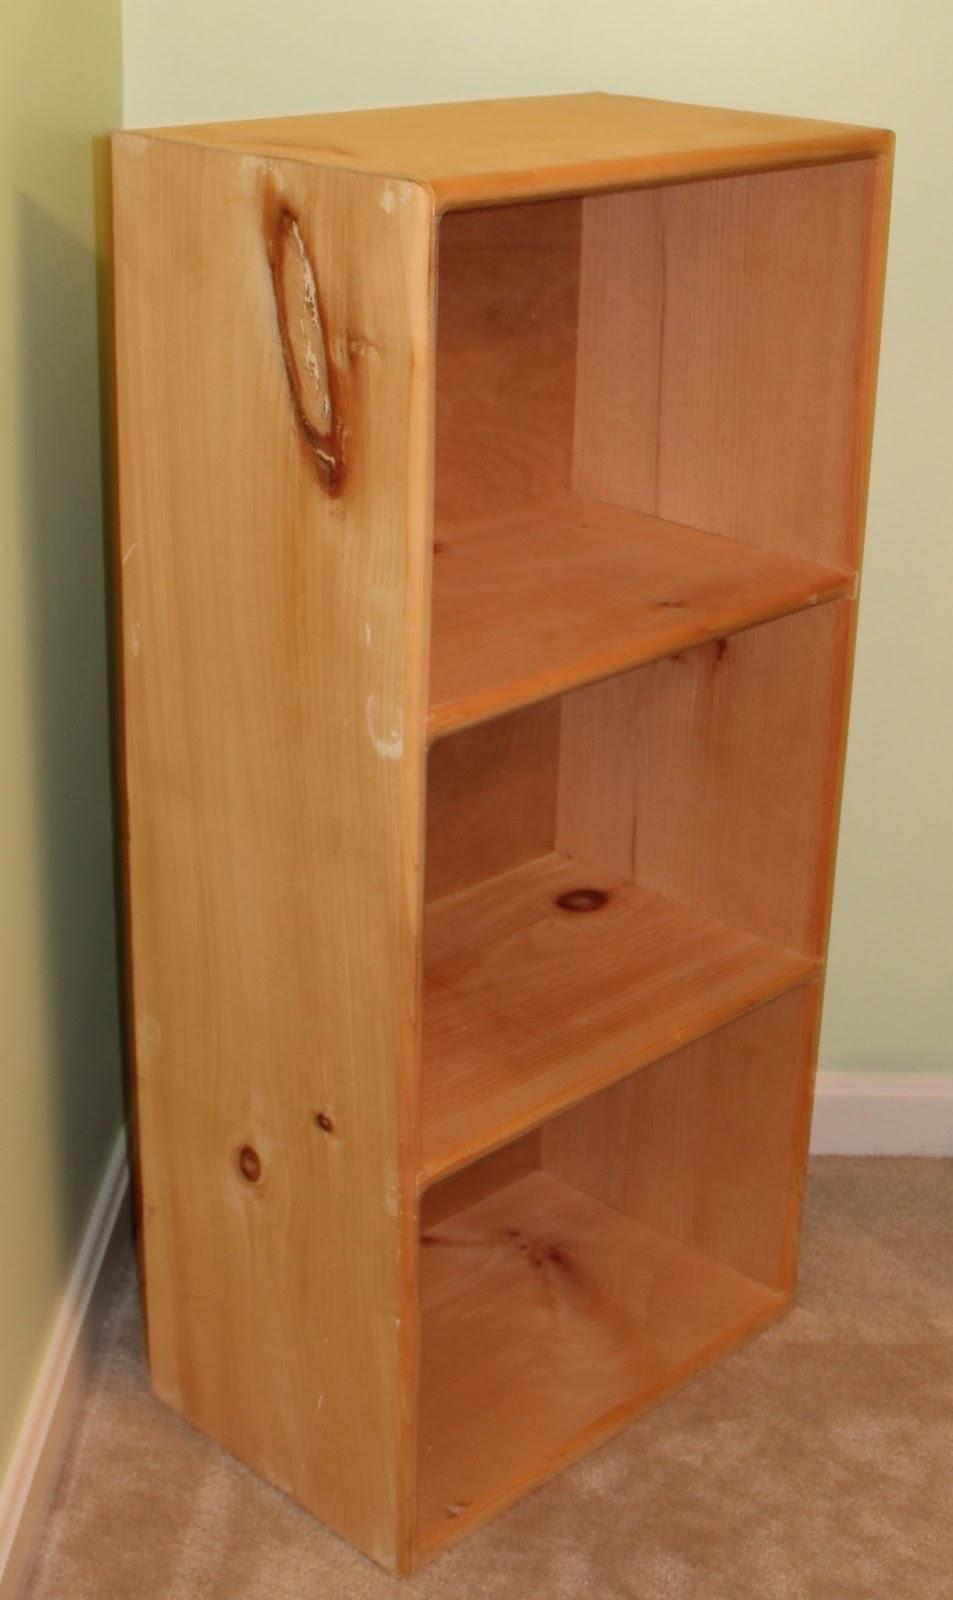 A Little Bolt of Life DIY Decoupage Bookcase